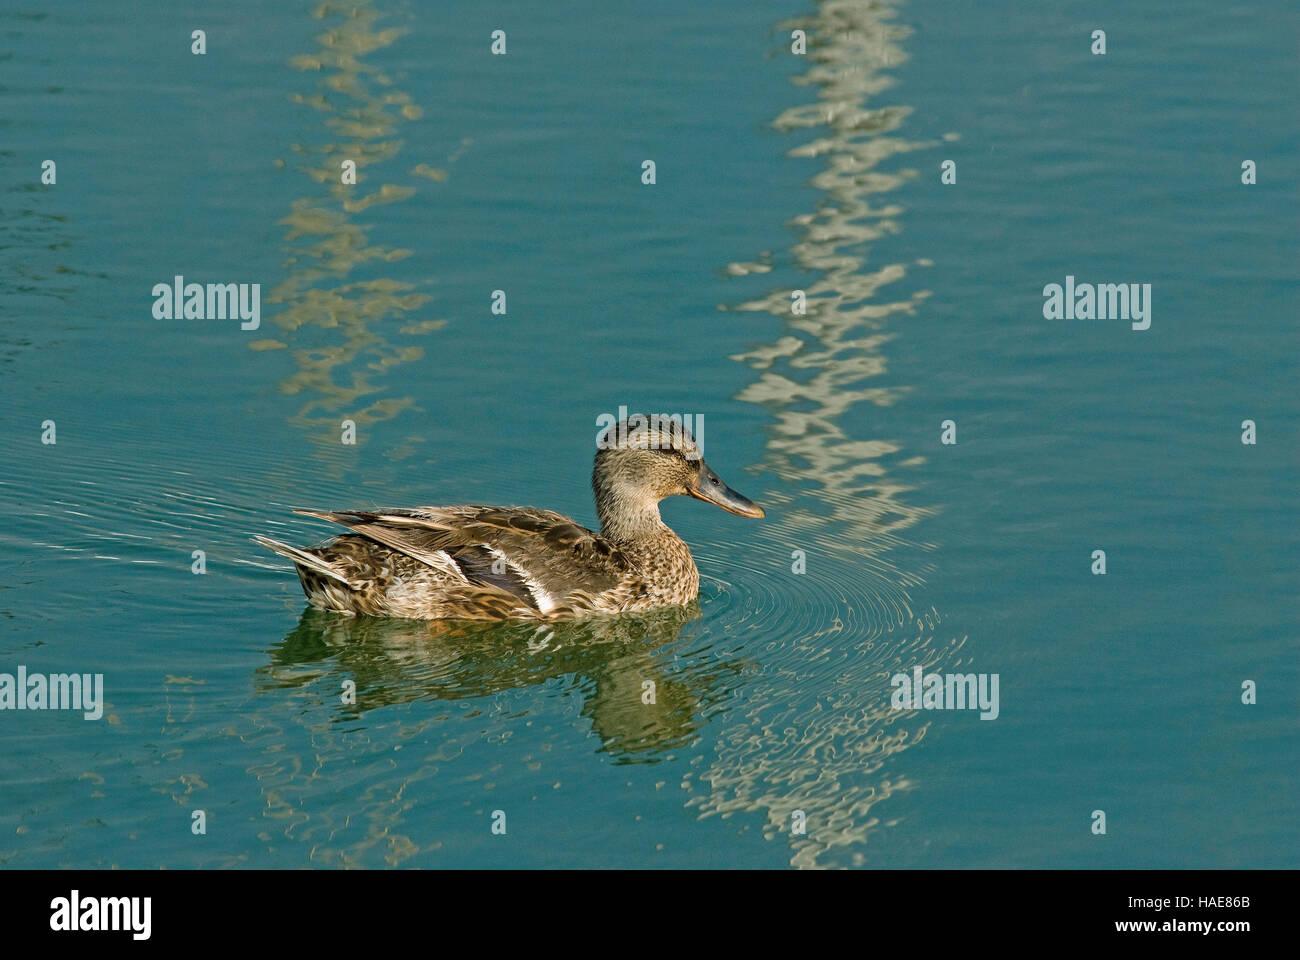 Mallard duck (Anas platyrhynchos), Lake Trasimeno, Umbria, Italy - Stock Image